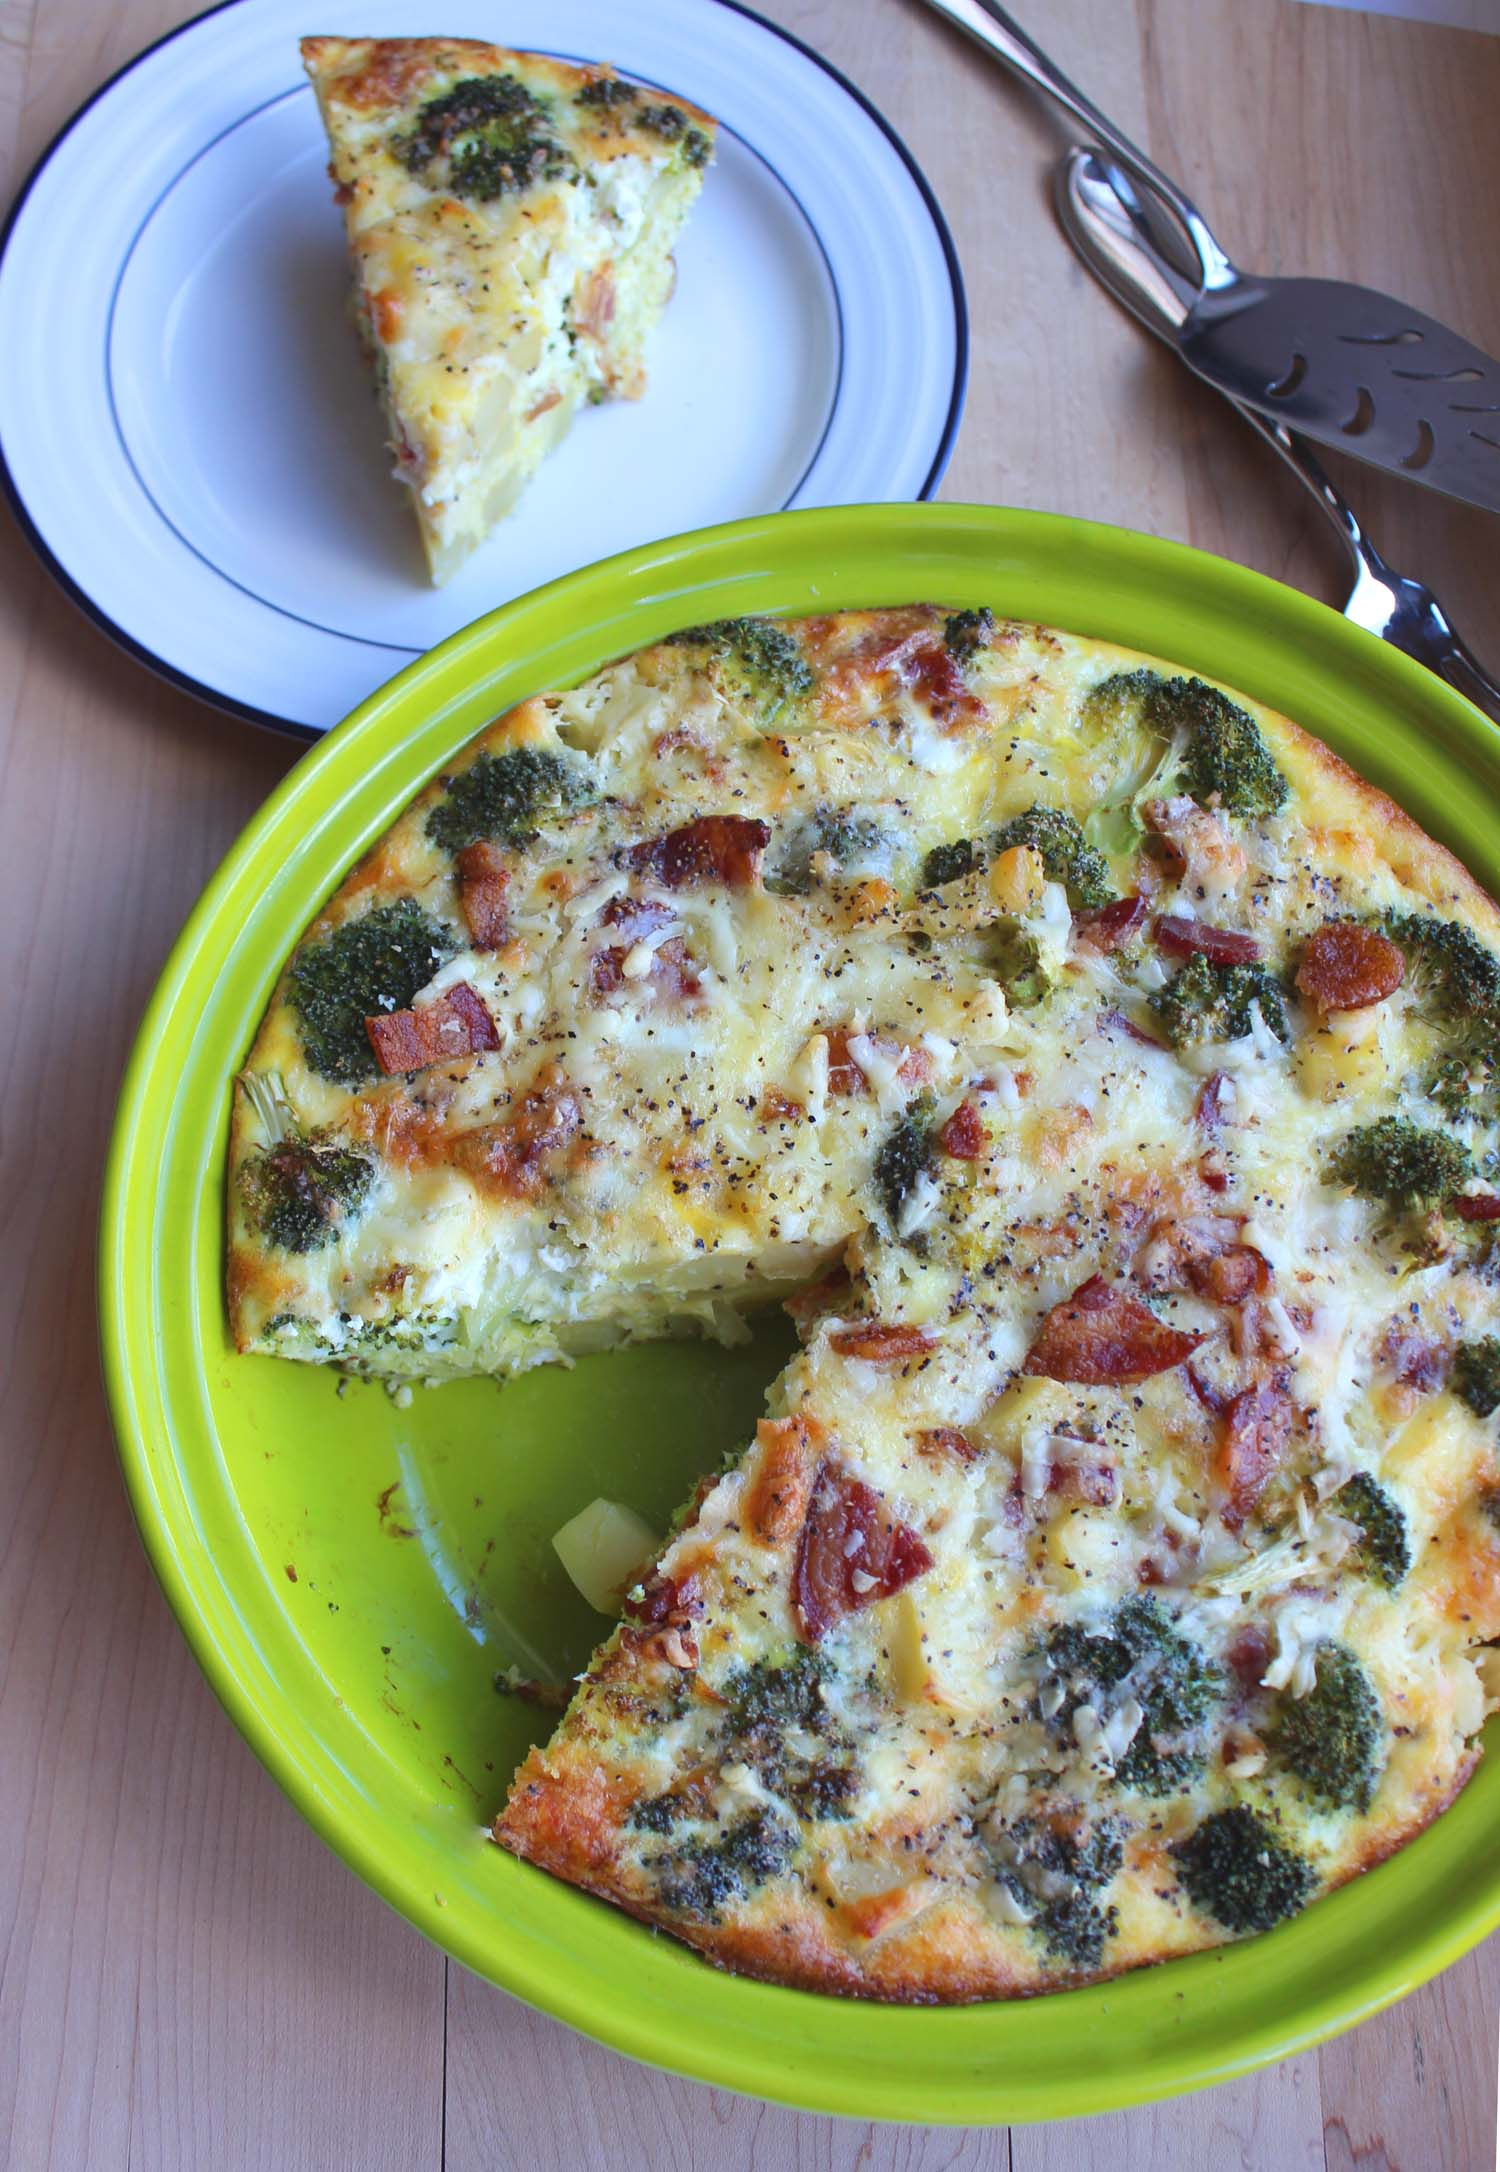 Cheddar Broccoli Frittata with Crispy Bacon  | Image:  Laura Messersmith